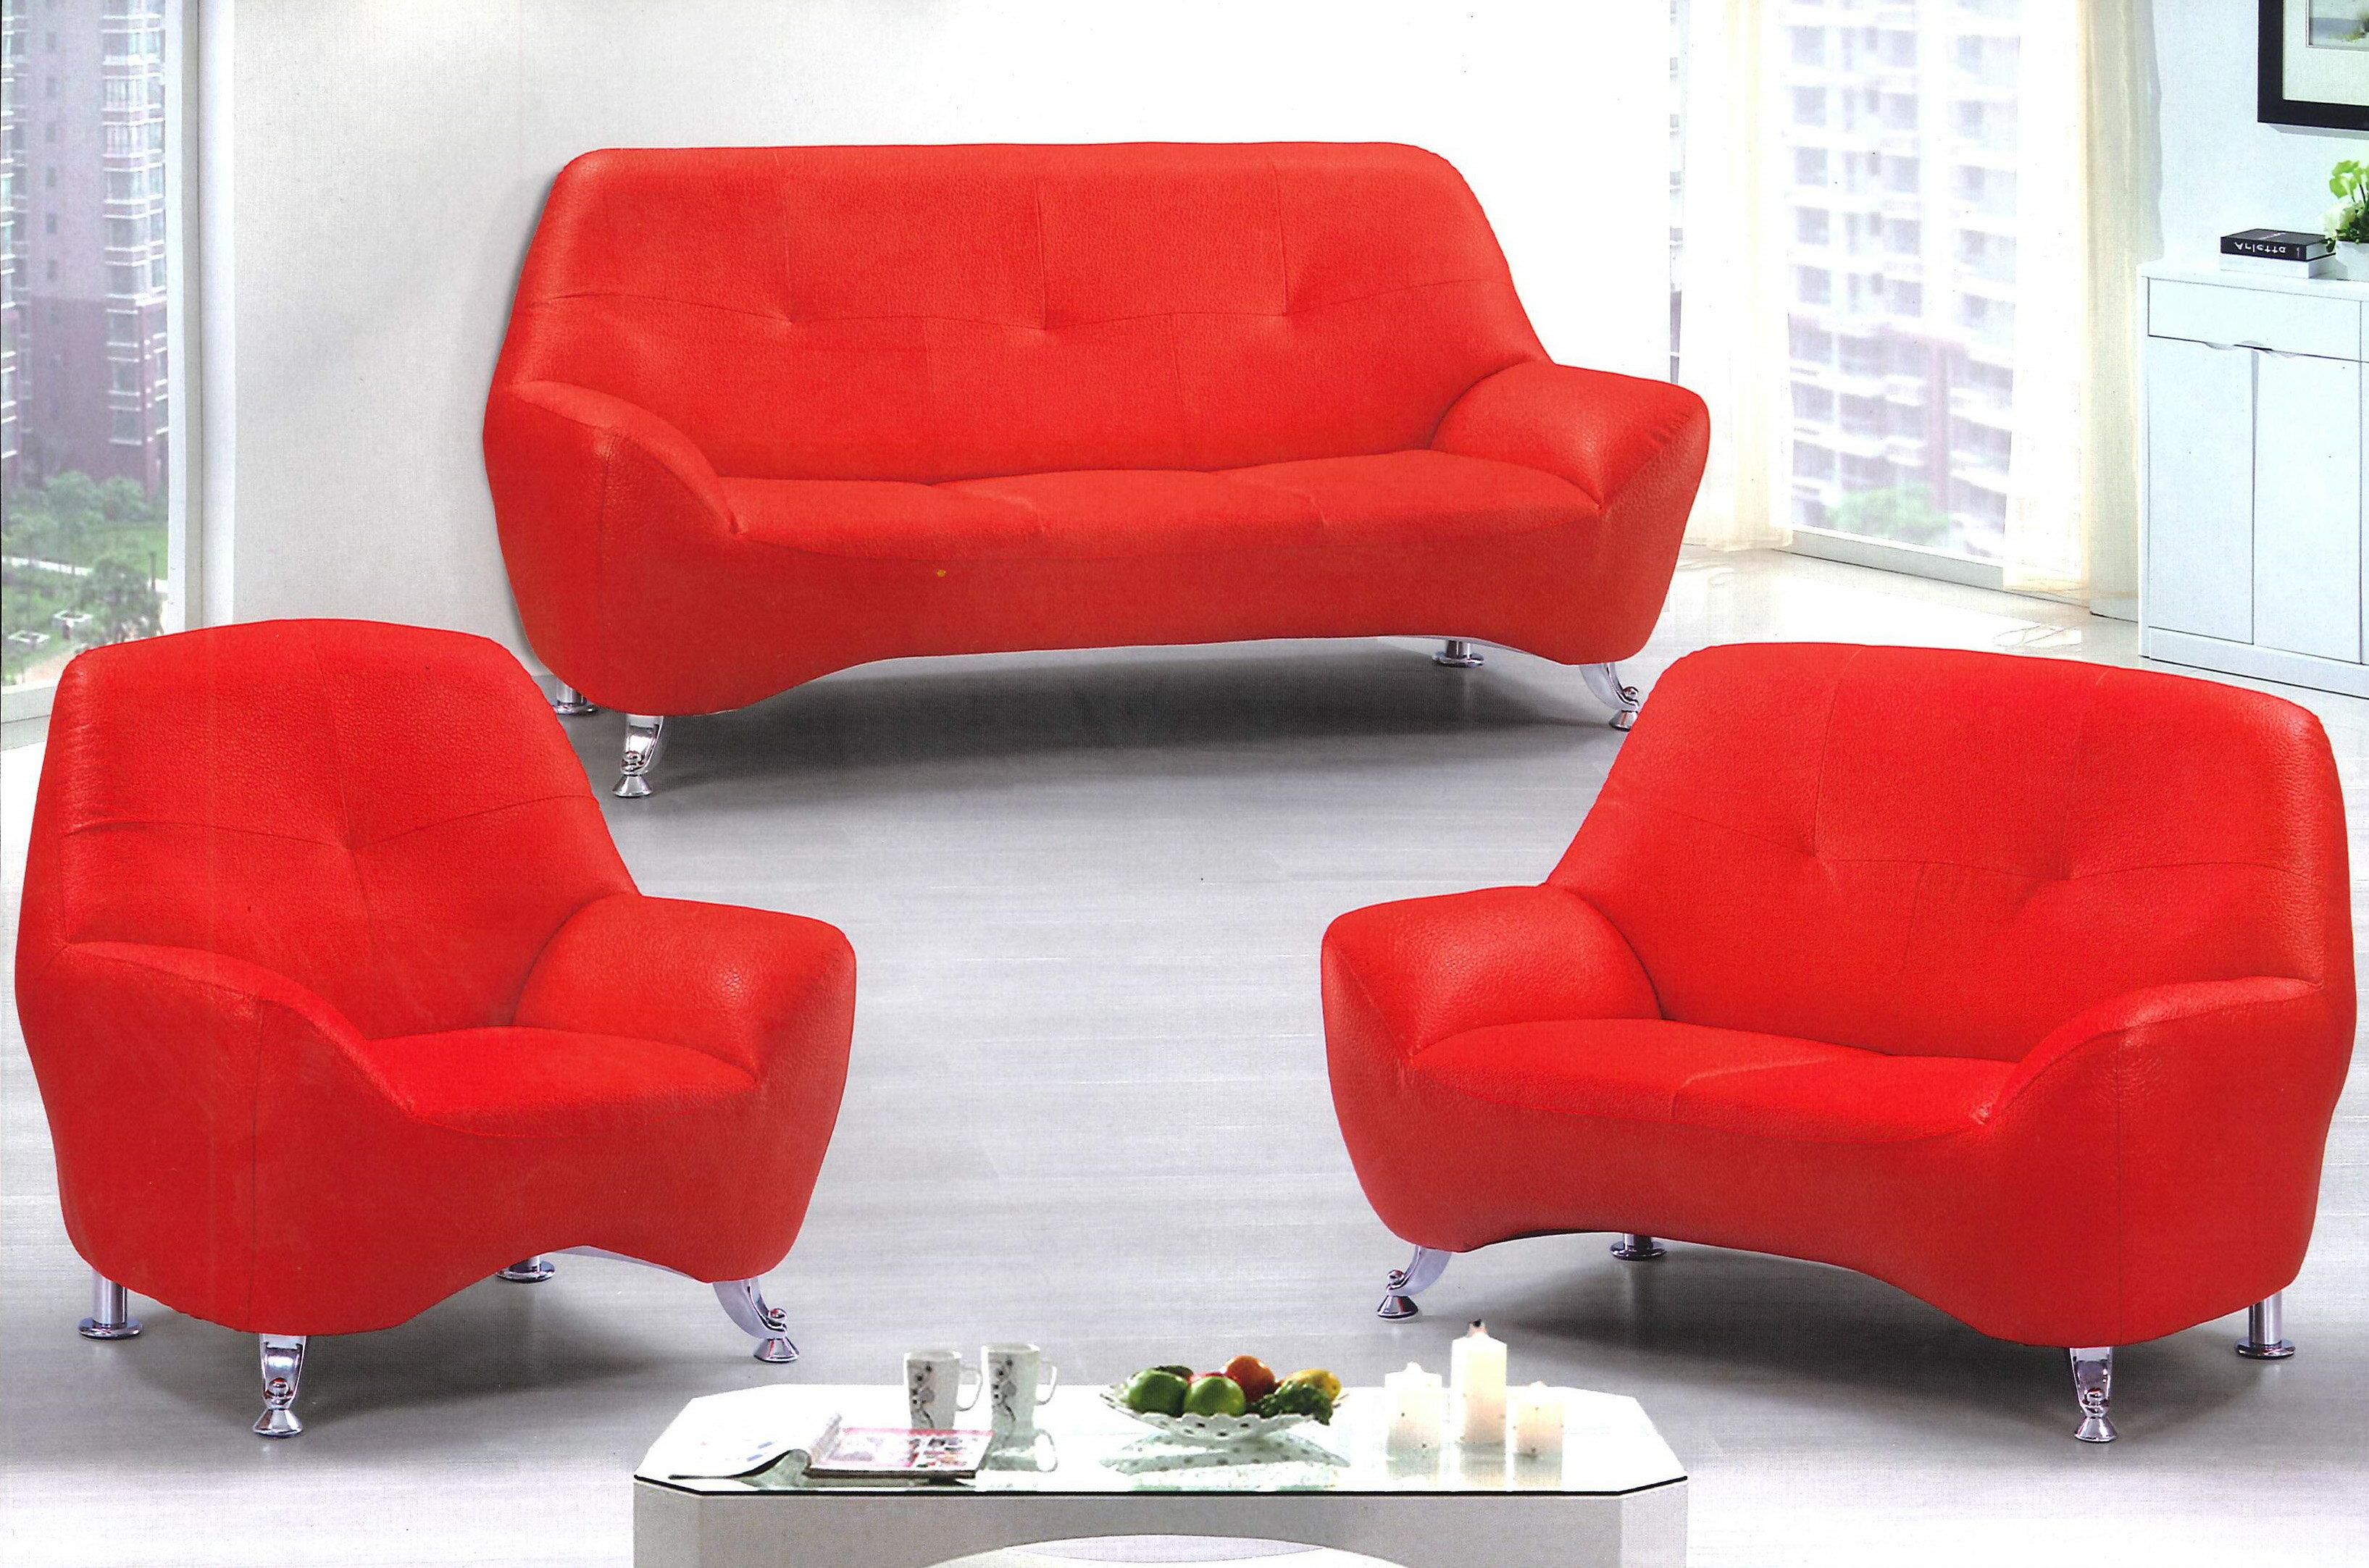 【MSL】繽紛生活皮面沙發組 - 限時優惠好康折扣